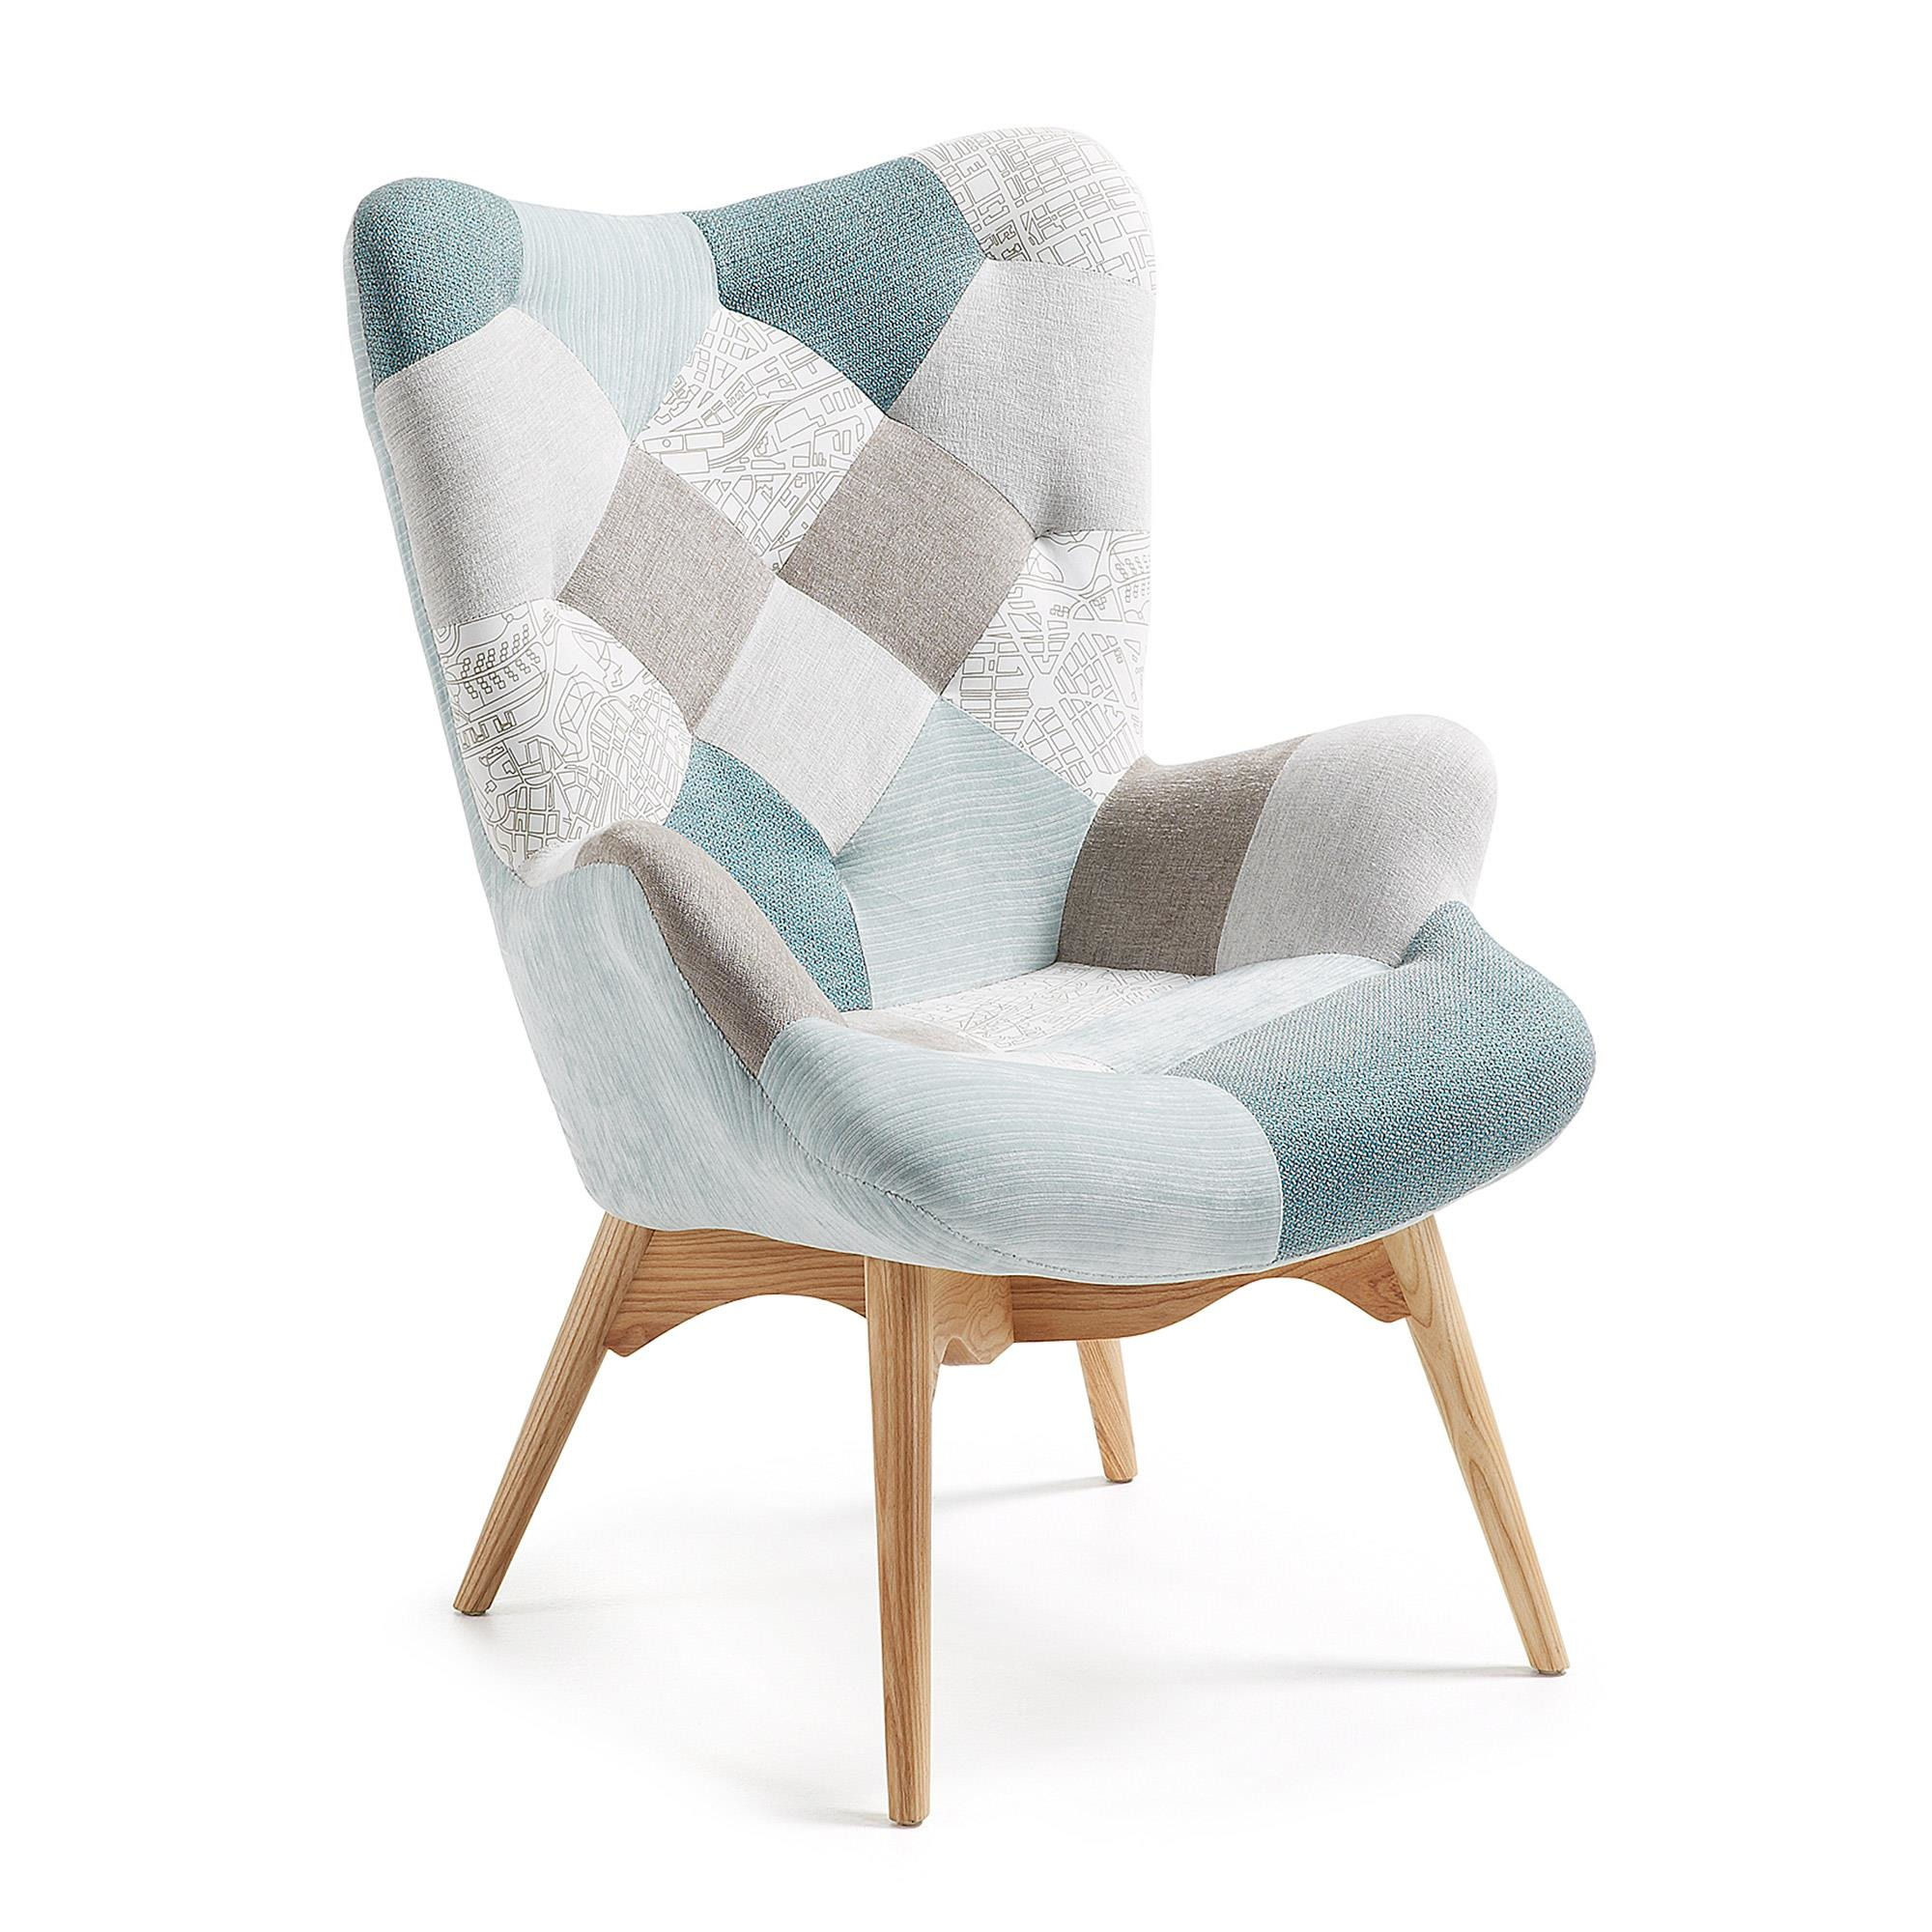 La Forma :: Fotel Knut jasnoniebieski patchwork